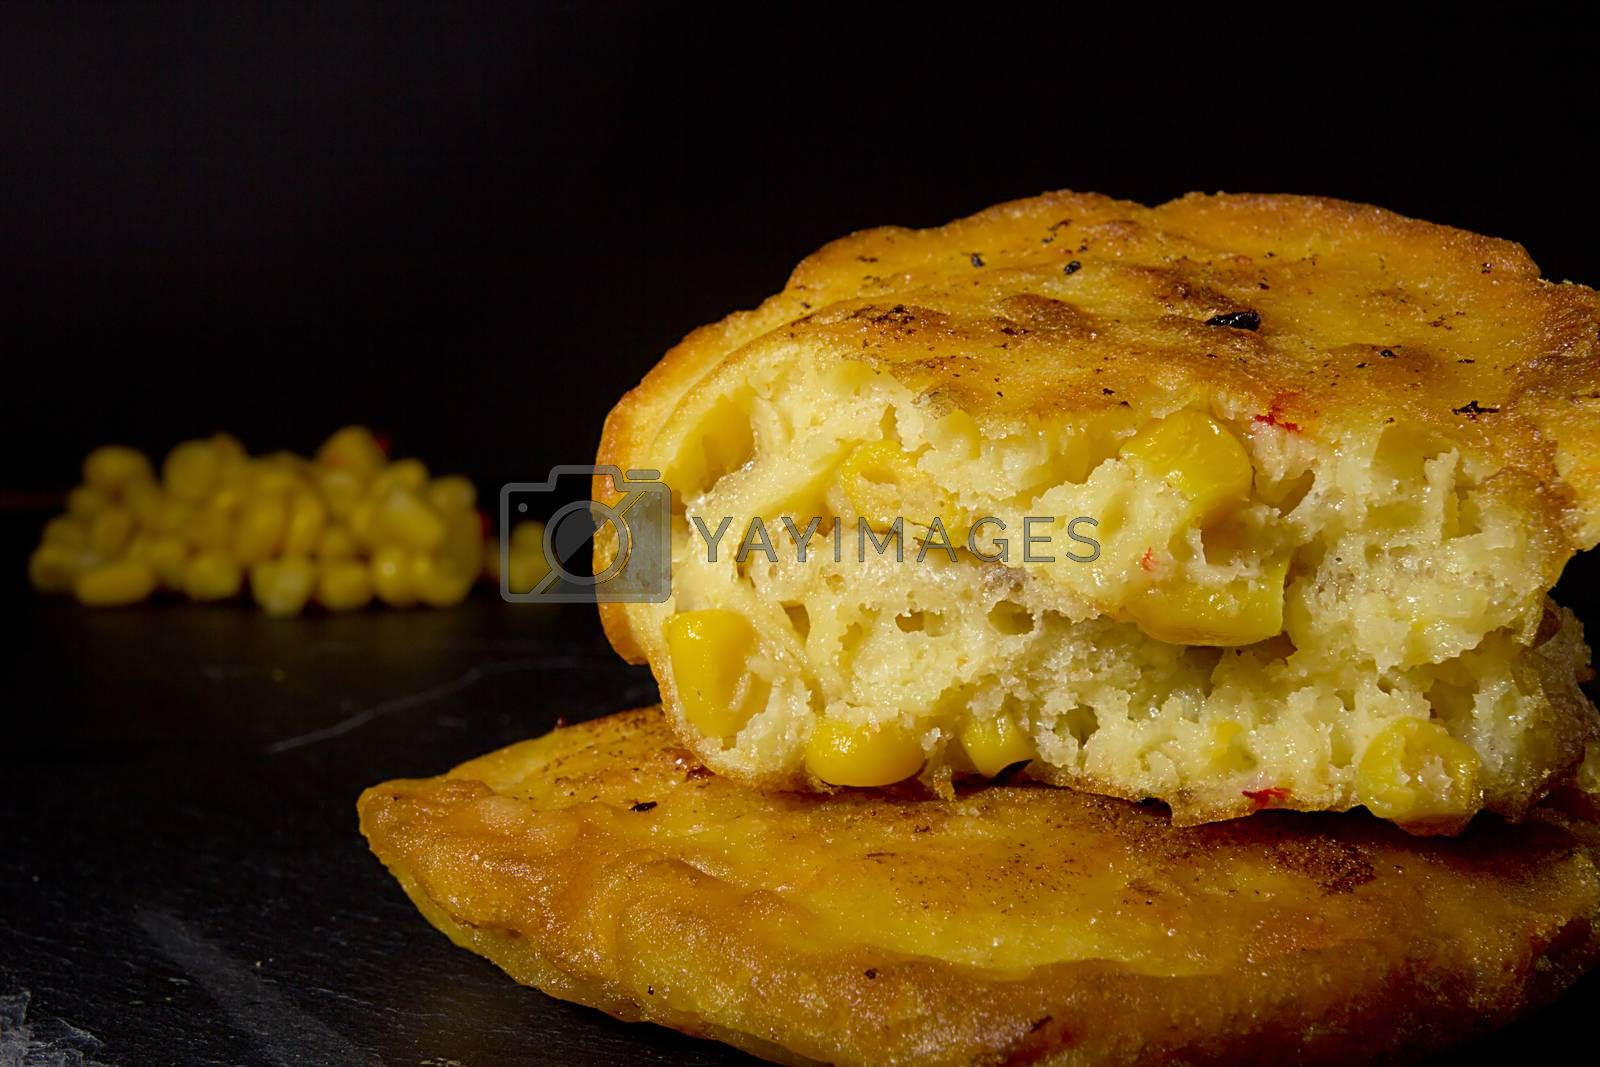 Broken corn pancakes close up on black background